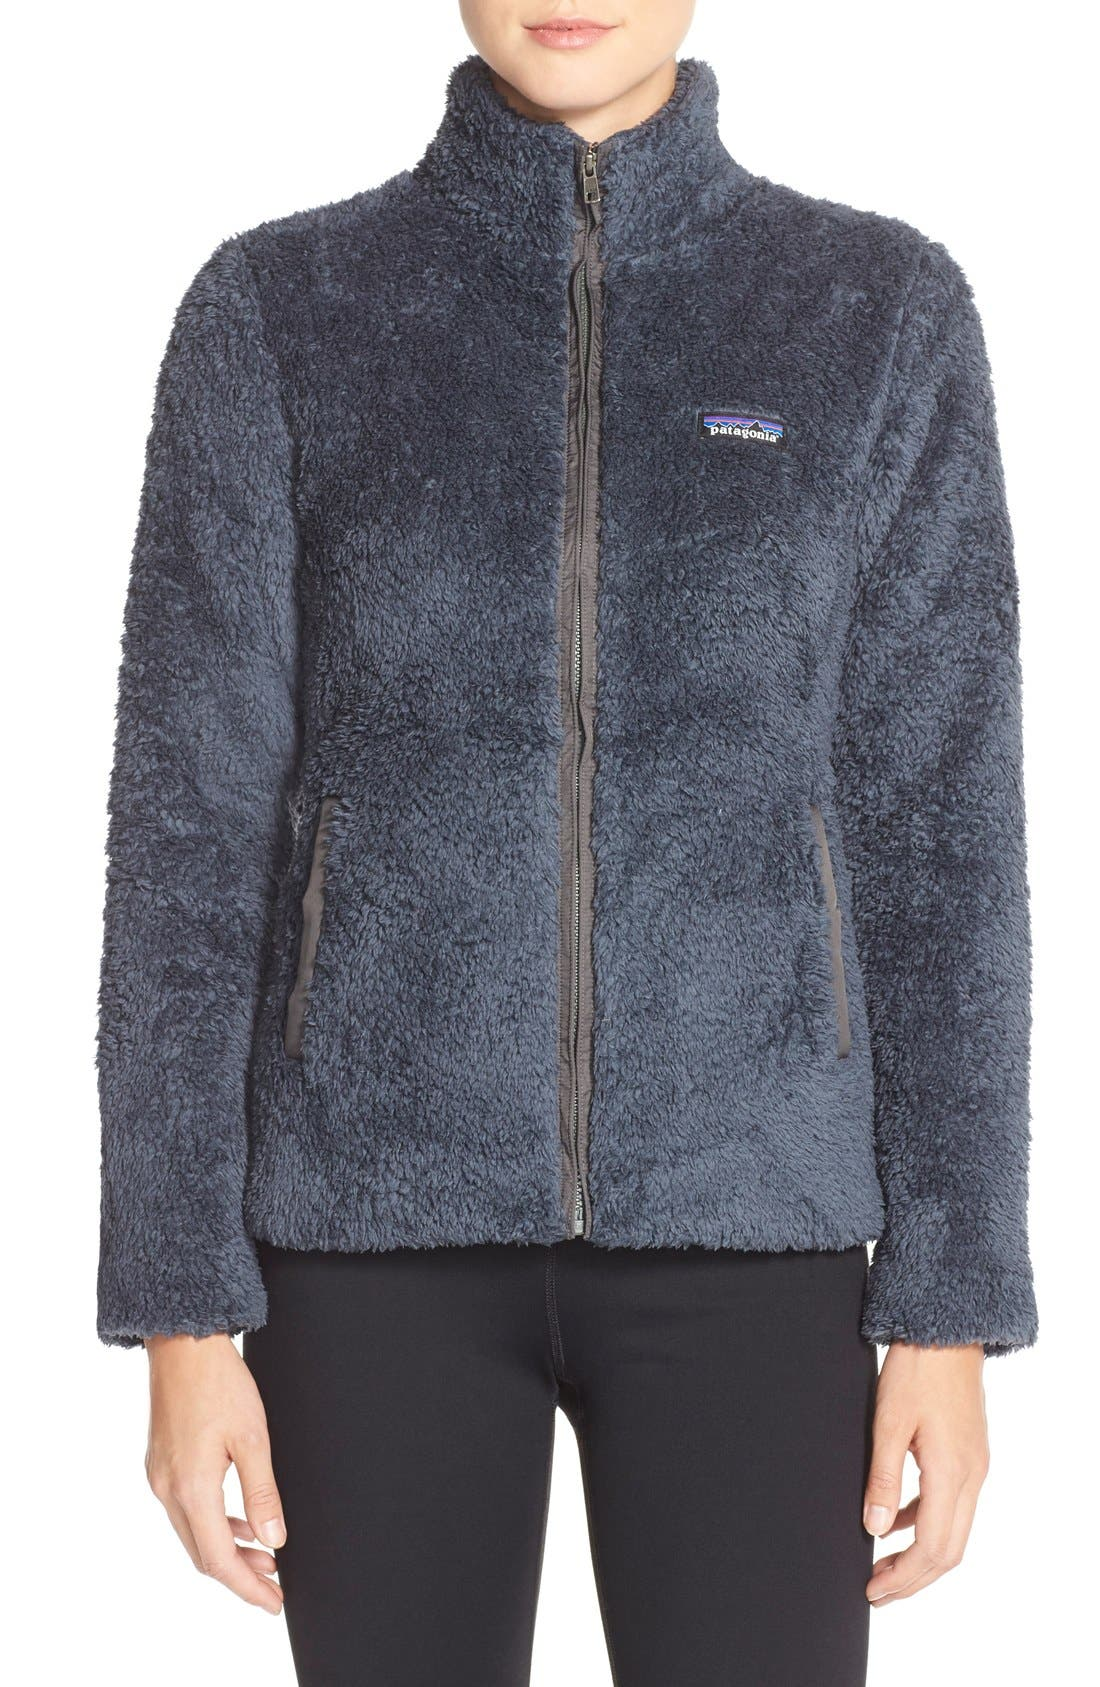 Alternate Image 1 Selected - Patagonia 'Los Gatos' Water Resistant Fleece Jacket